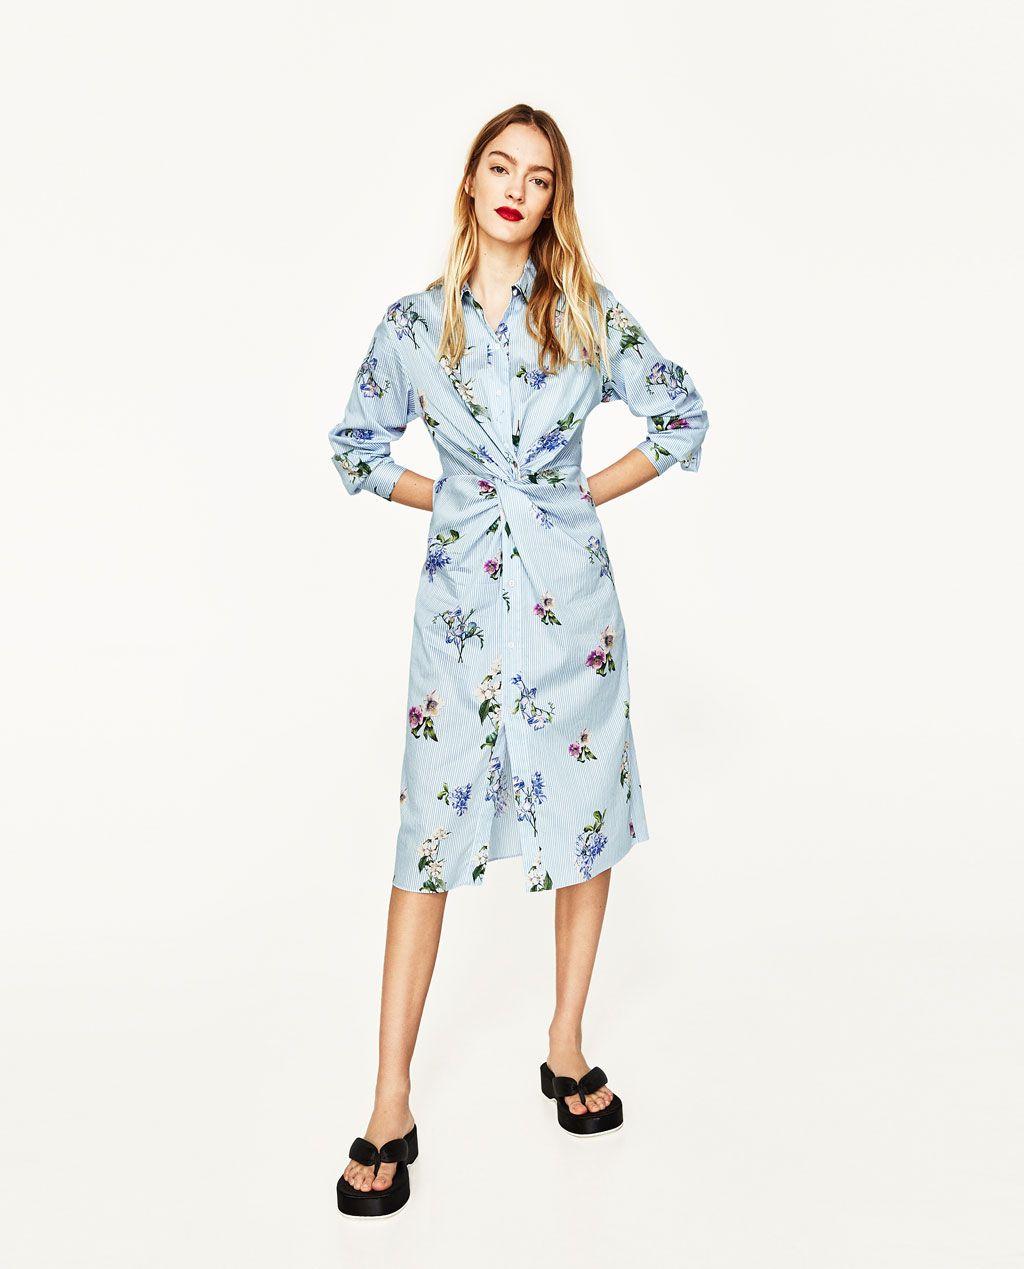 ac71d0bc TÚNICA ESTAMPADA CON NUDO | Zara | Knot dress, Zara dresses, Fashion